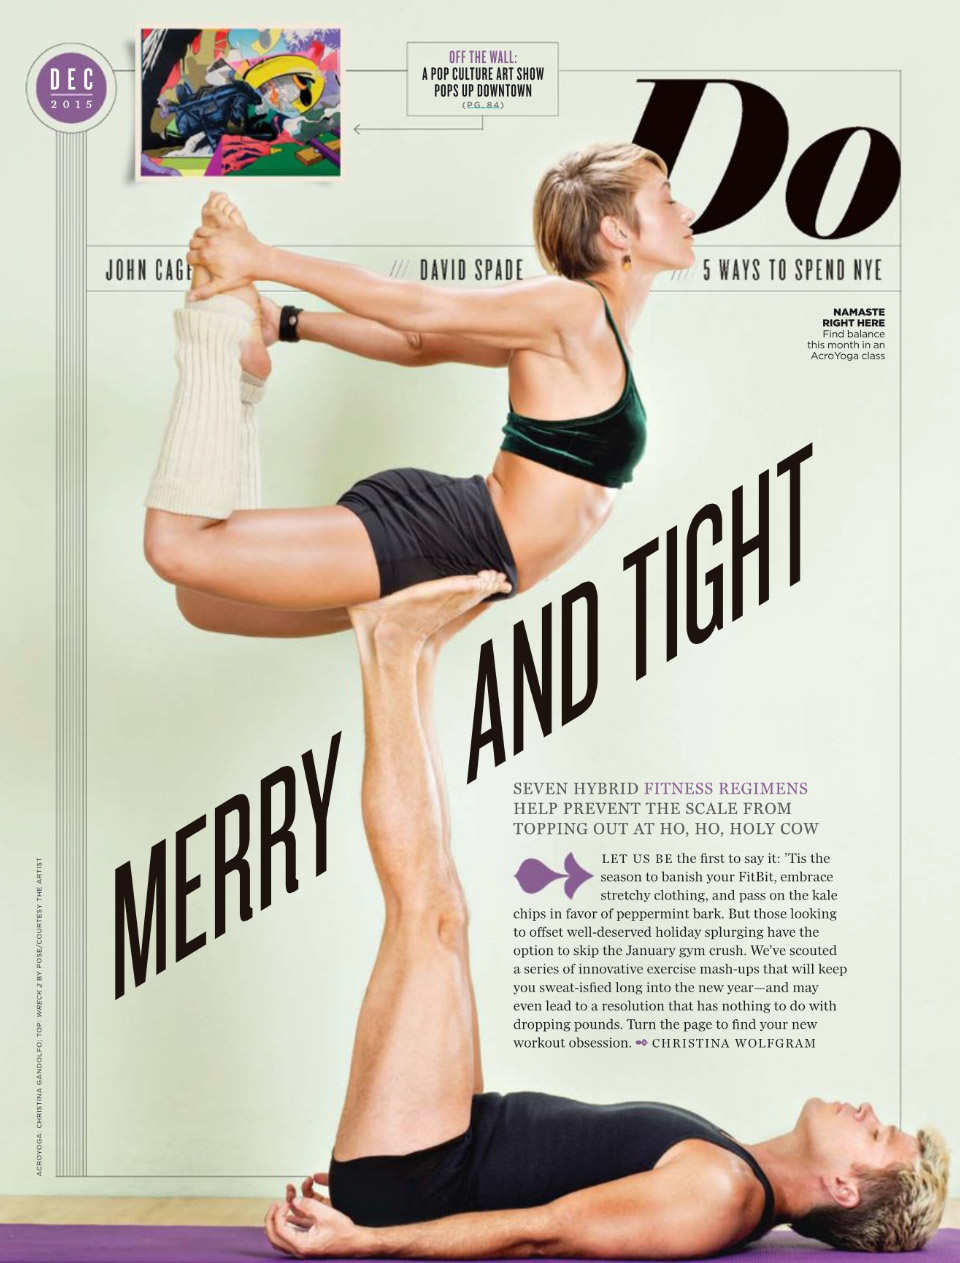 AcroYoga in LA Magazine - December 2015 - Ashley Witham & Chris Filkins